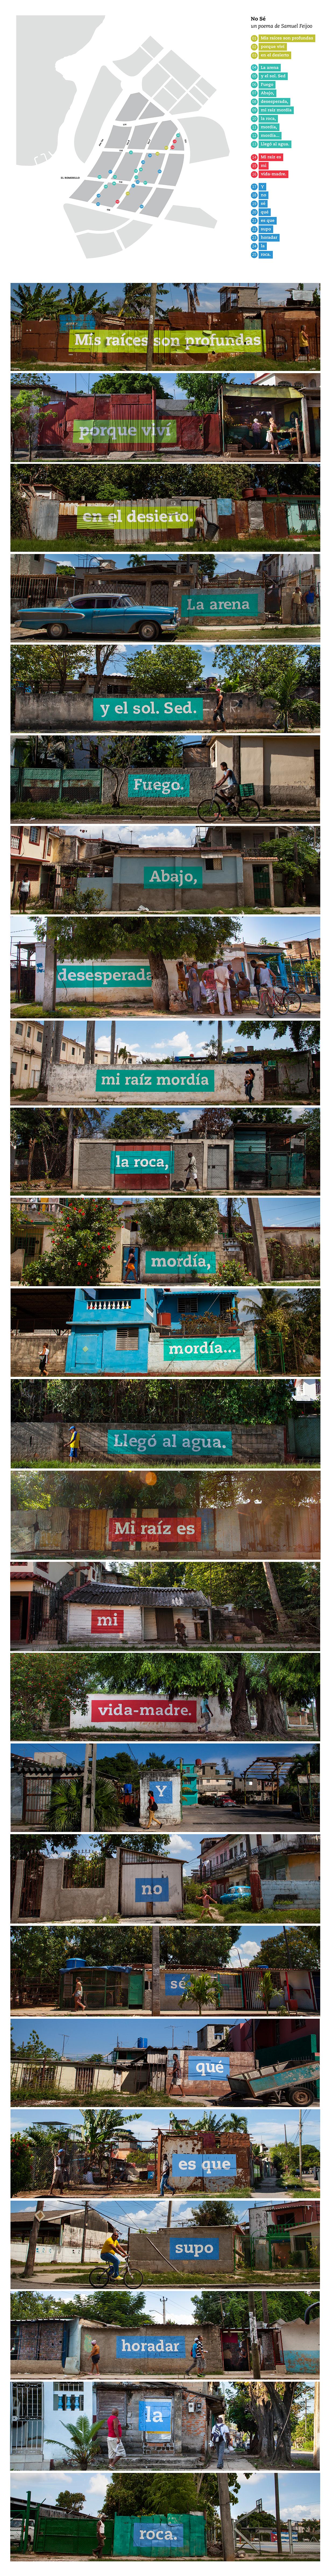 BoaMistura_Bienal_laHabana_Poema